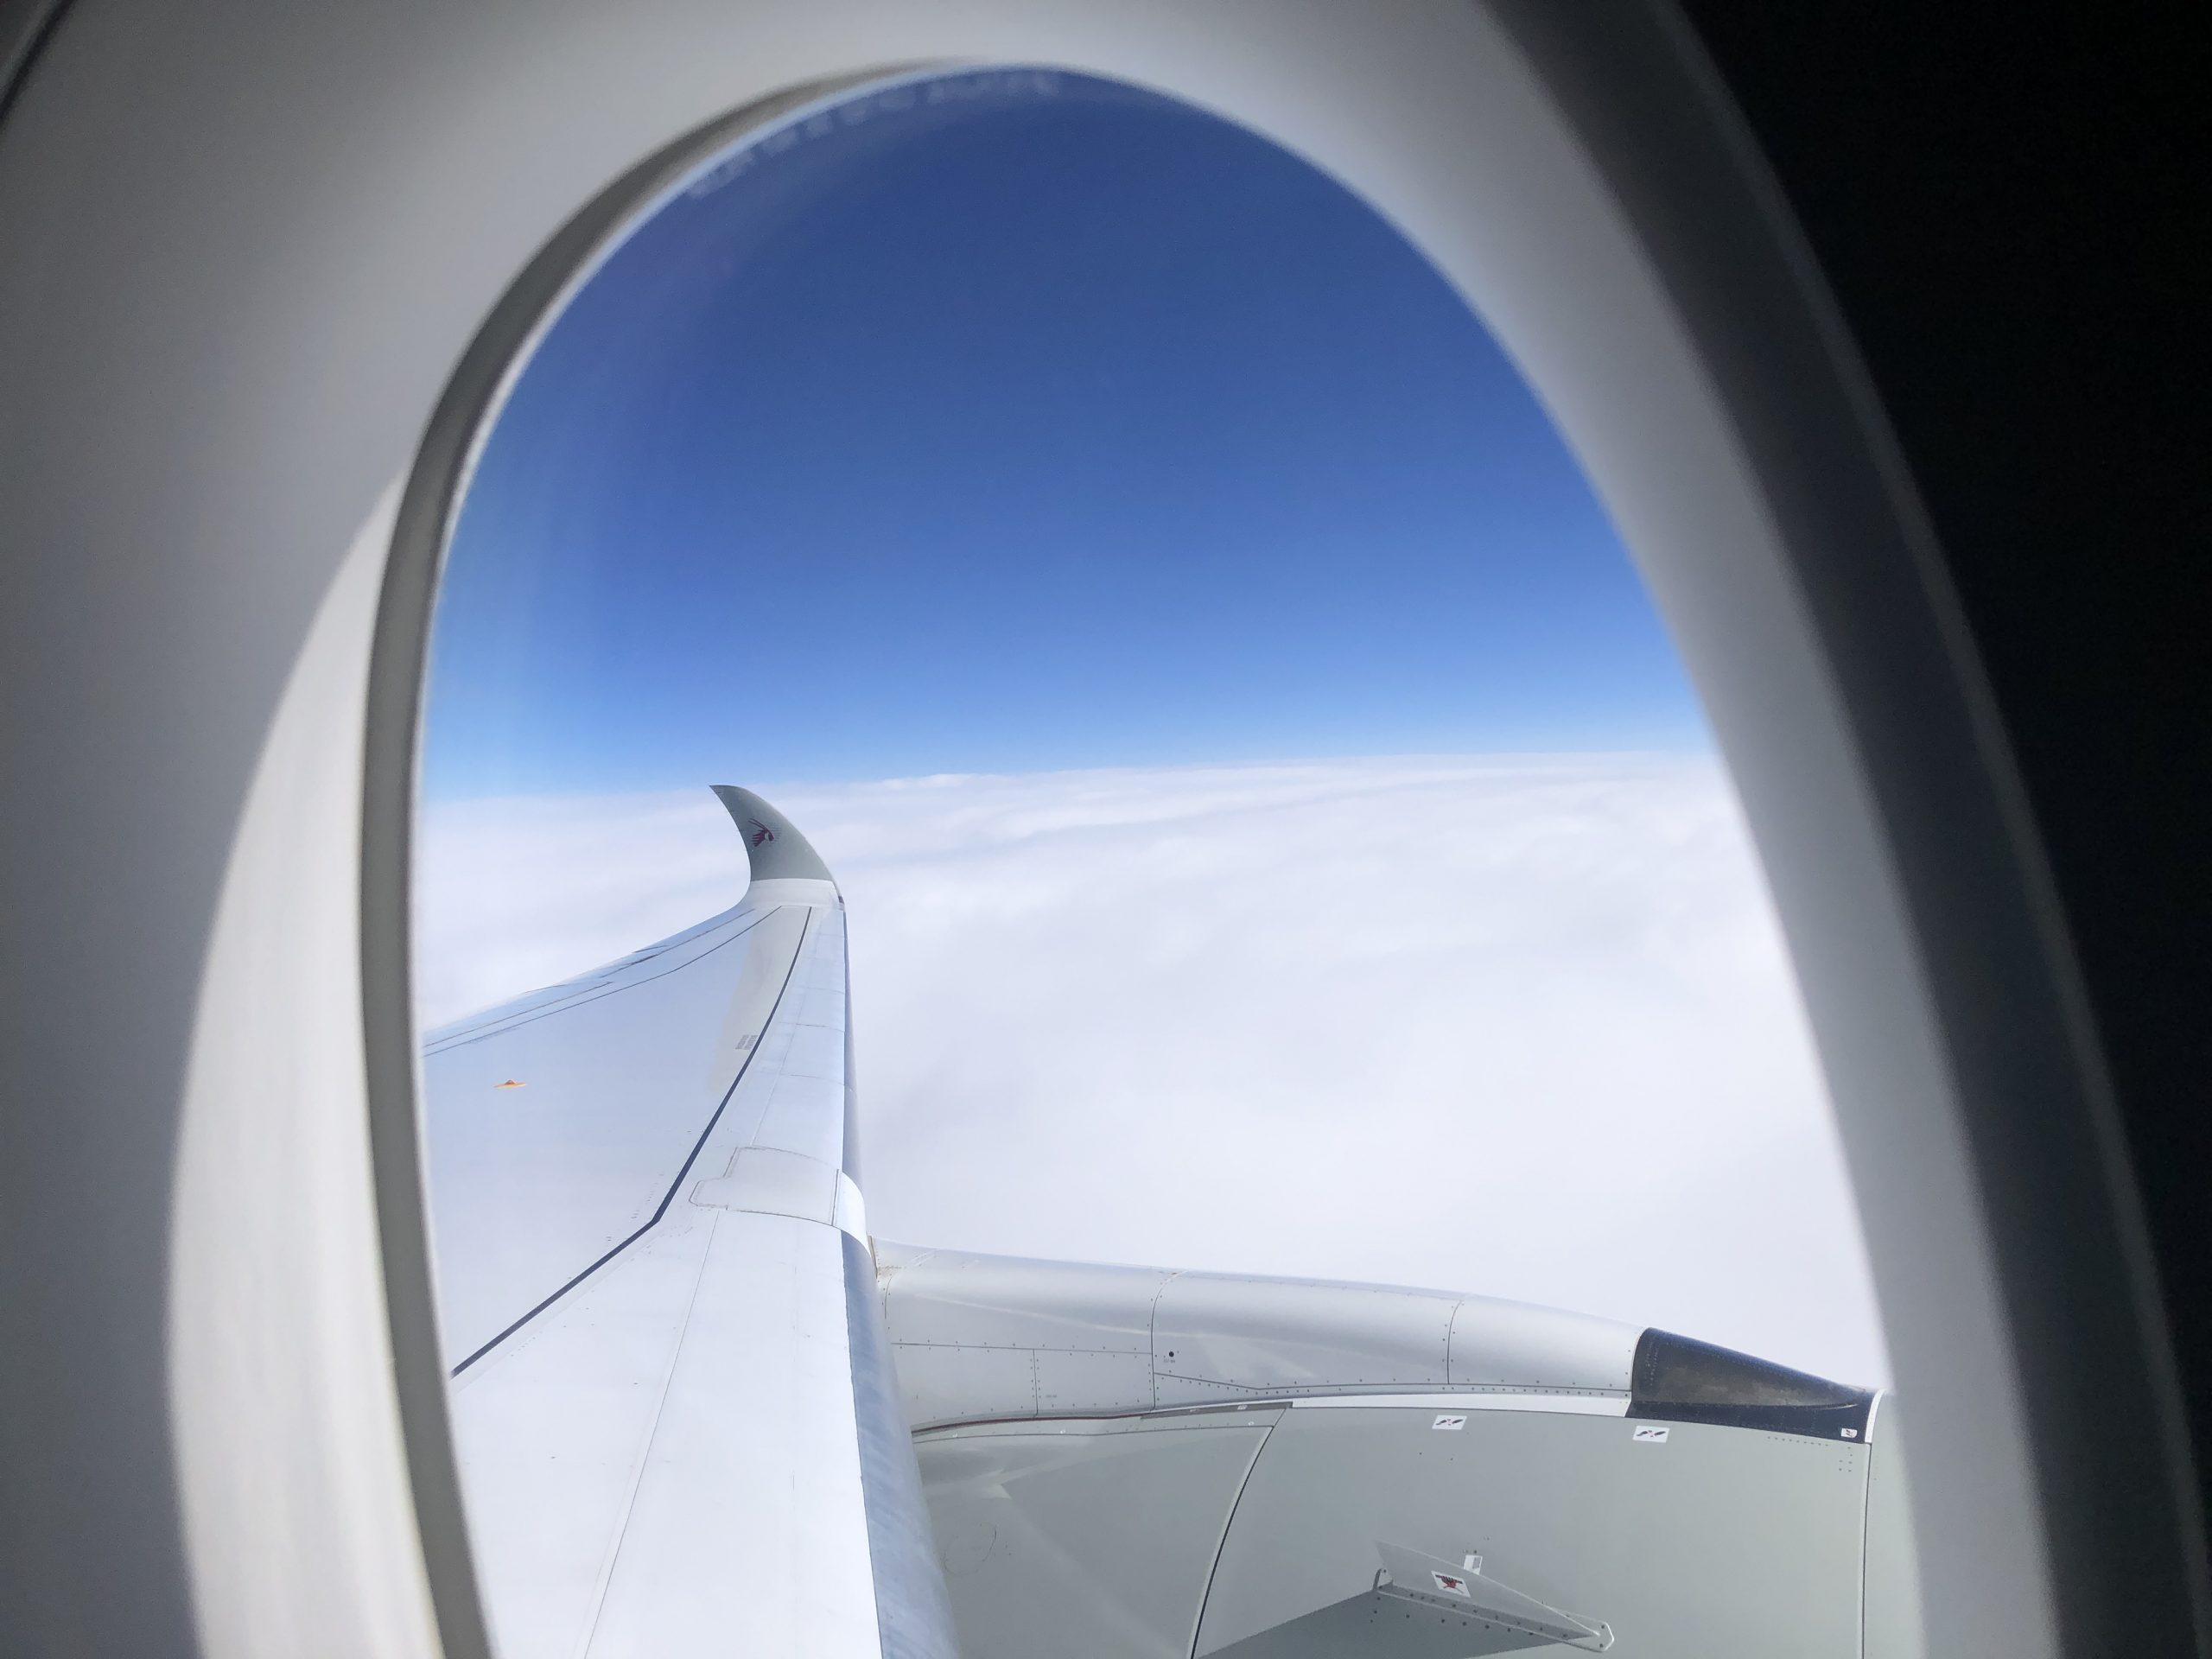 Business Class Review : カタール航空(QR) QR42 パリ・シャルルドゴール(CDG) – ドーハ(DOH) エアバス A350-1000 QSuite